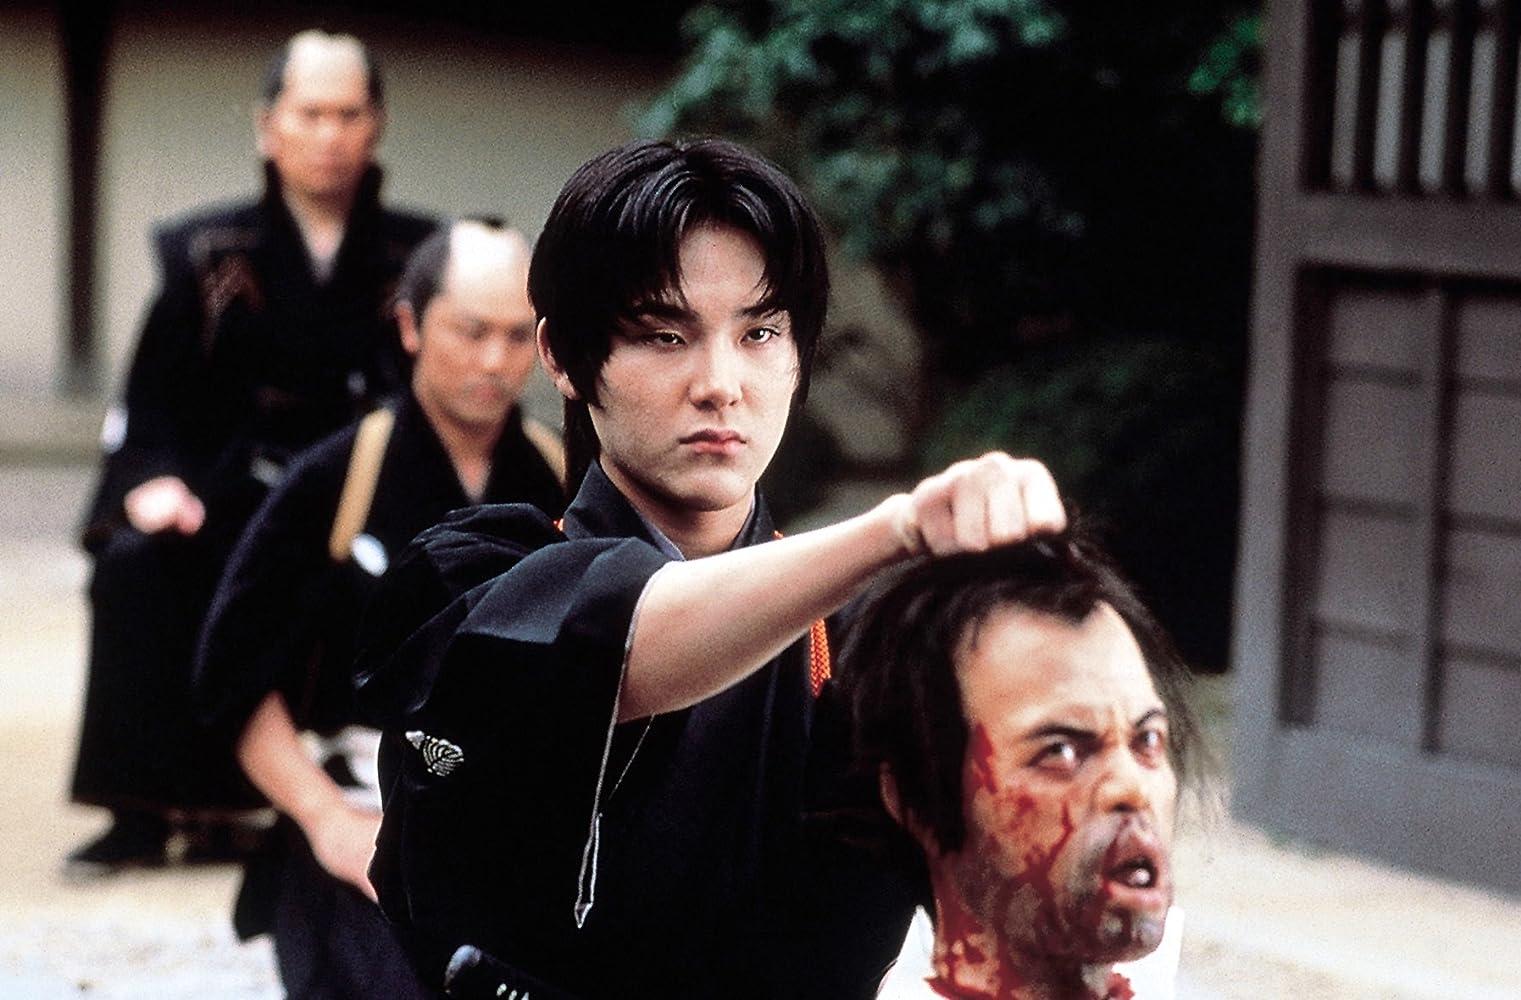 Ryûhei Matsuda in Gohatto (1999)